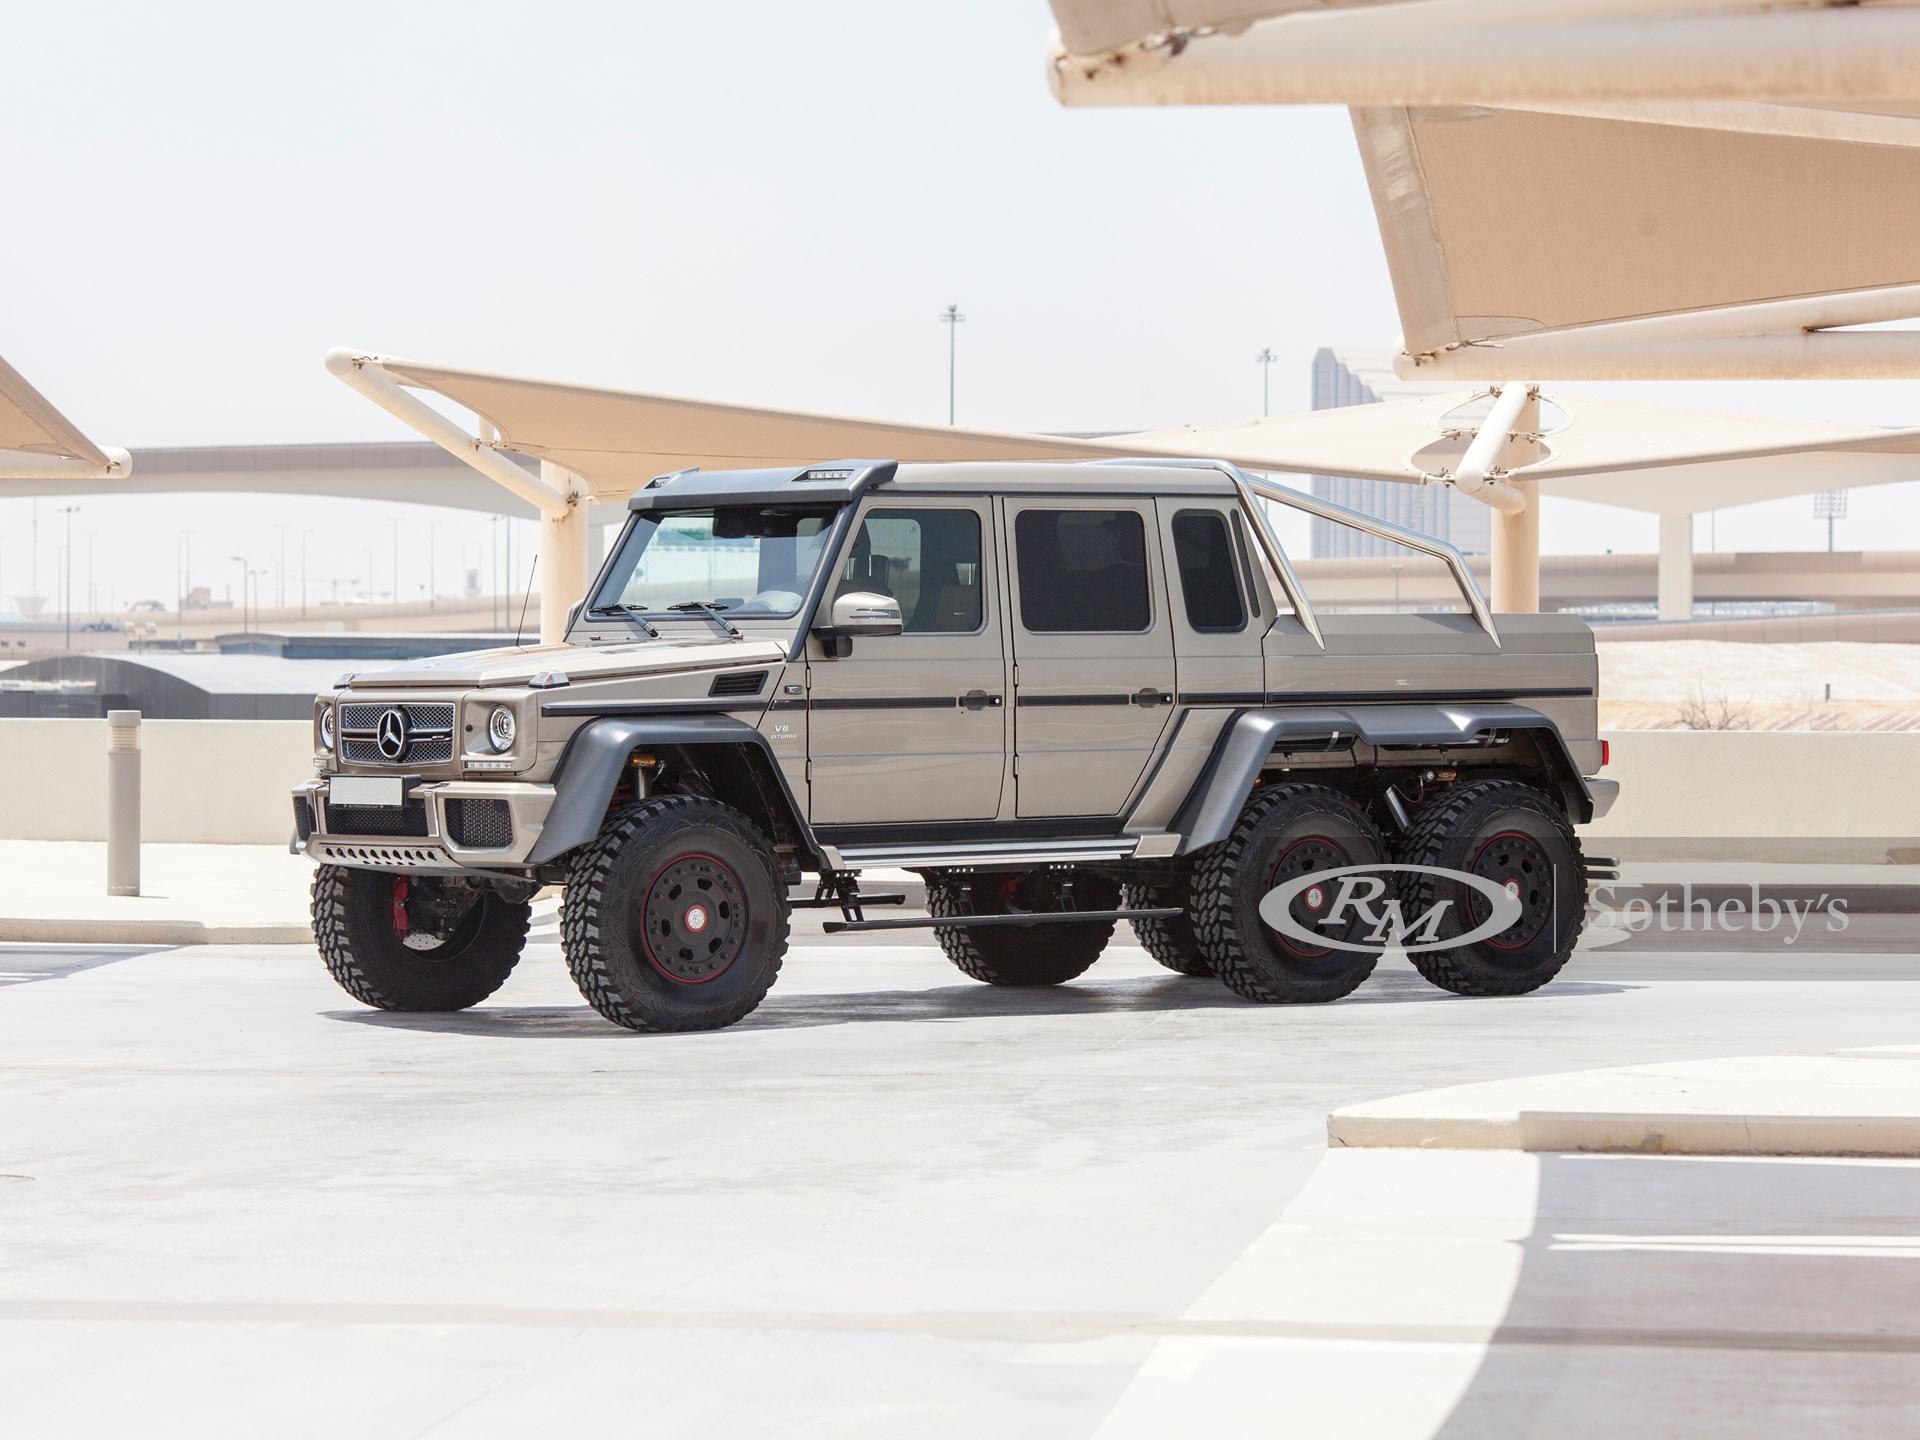 2015 Mercedes Benz G63 Amg 6 6 Abu Dhabi 2019 Rm Sotheby S